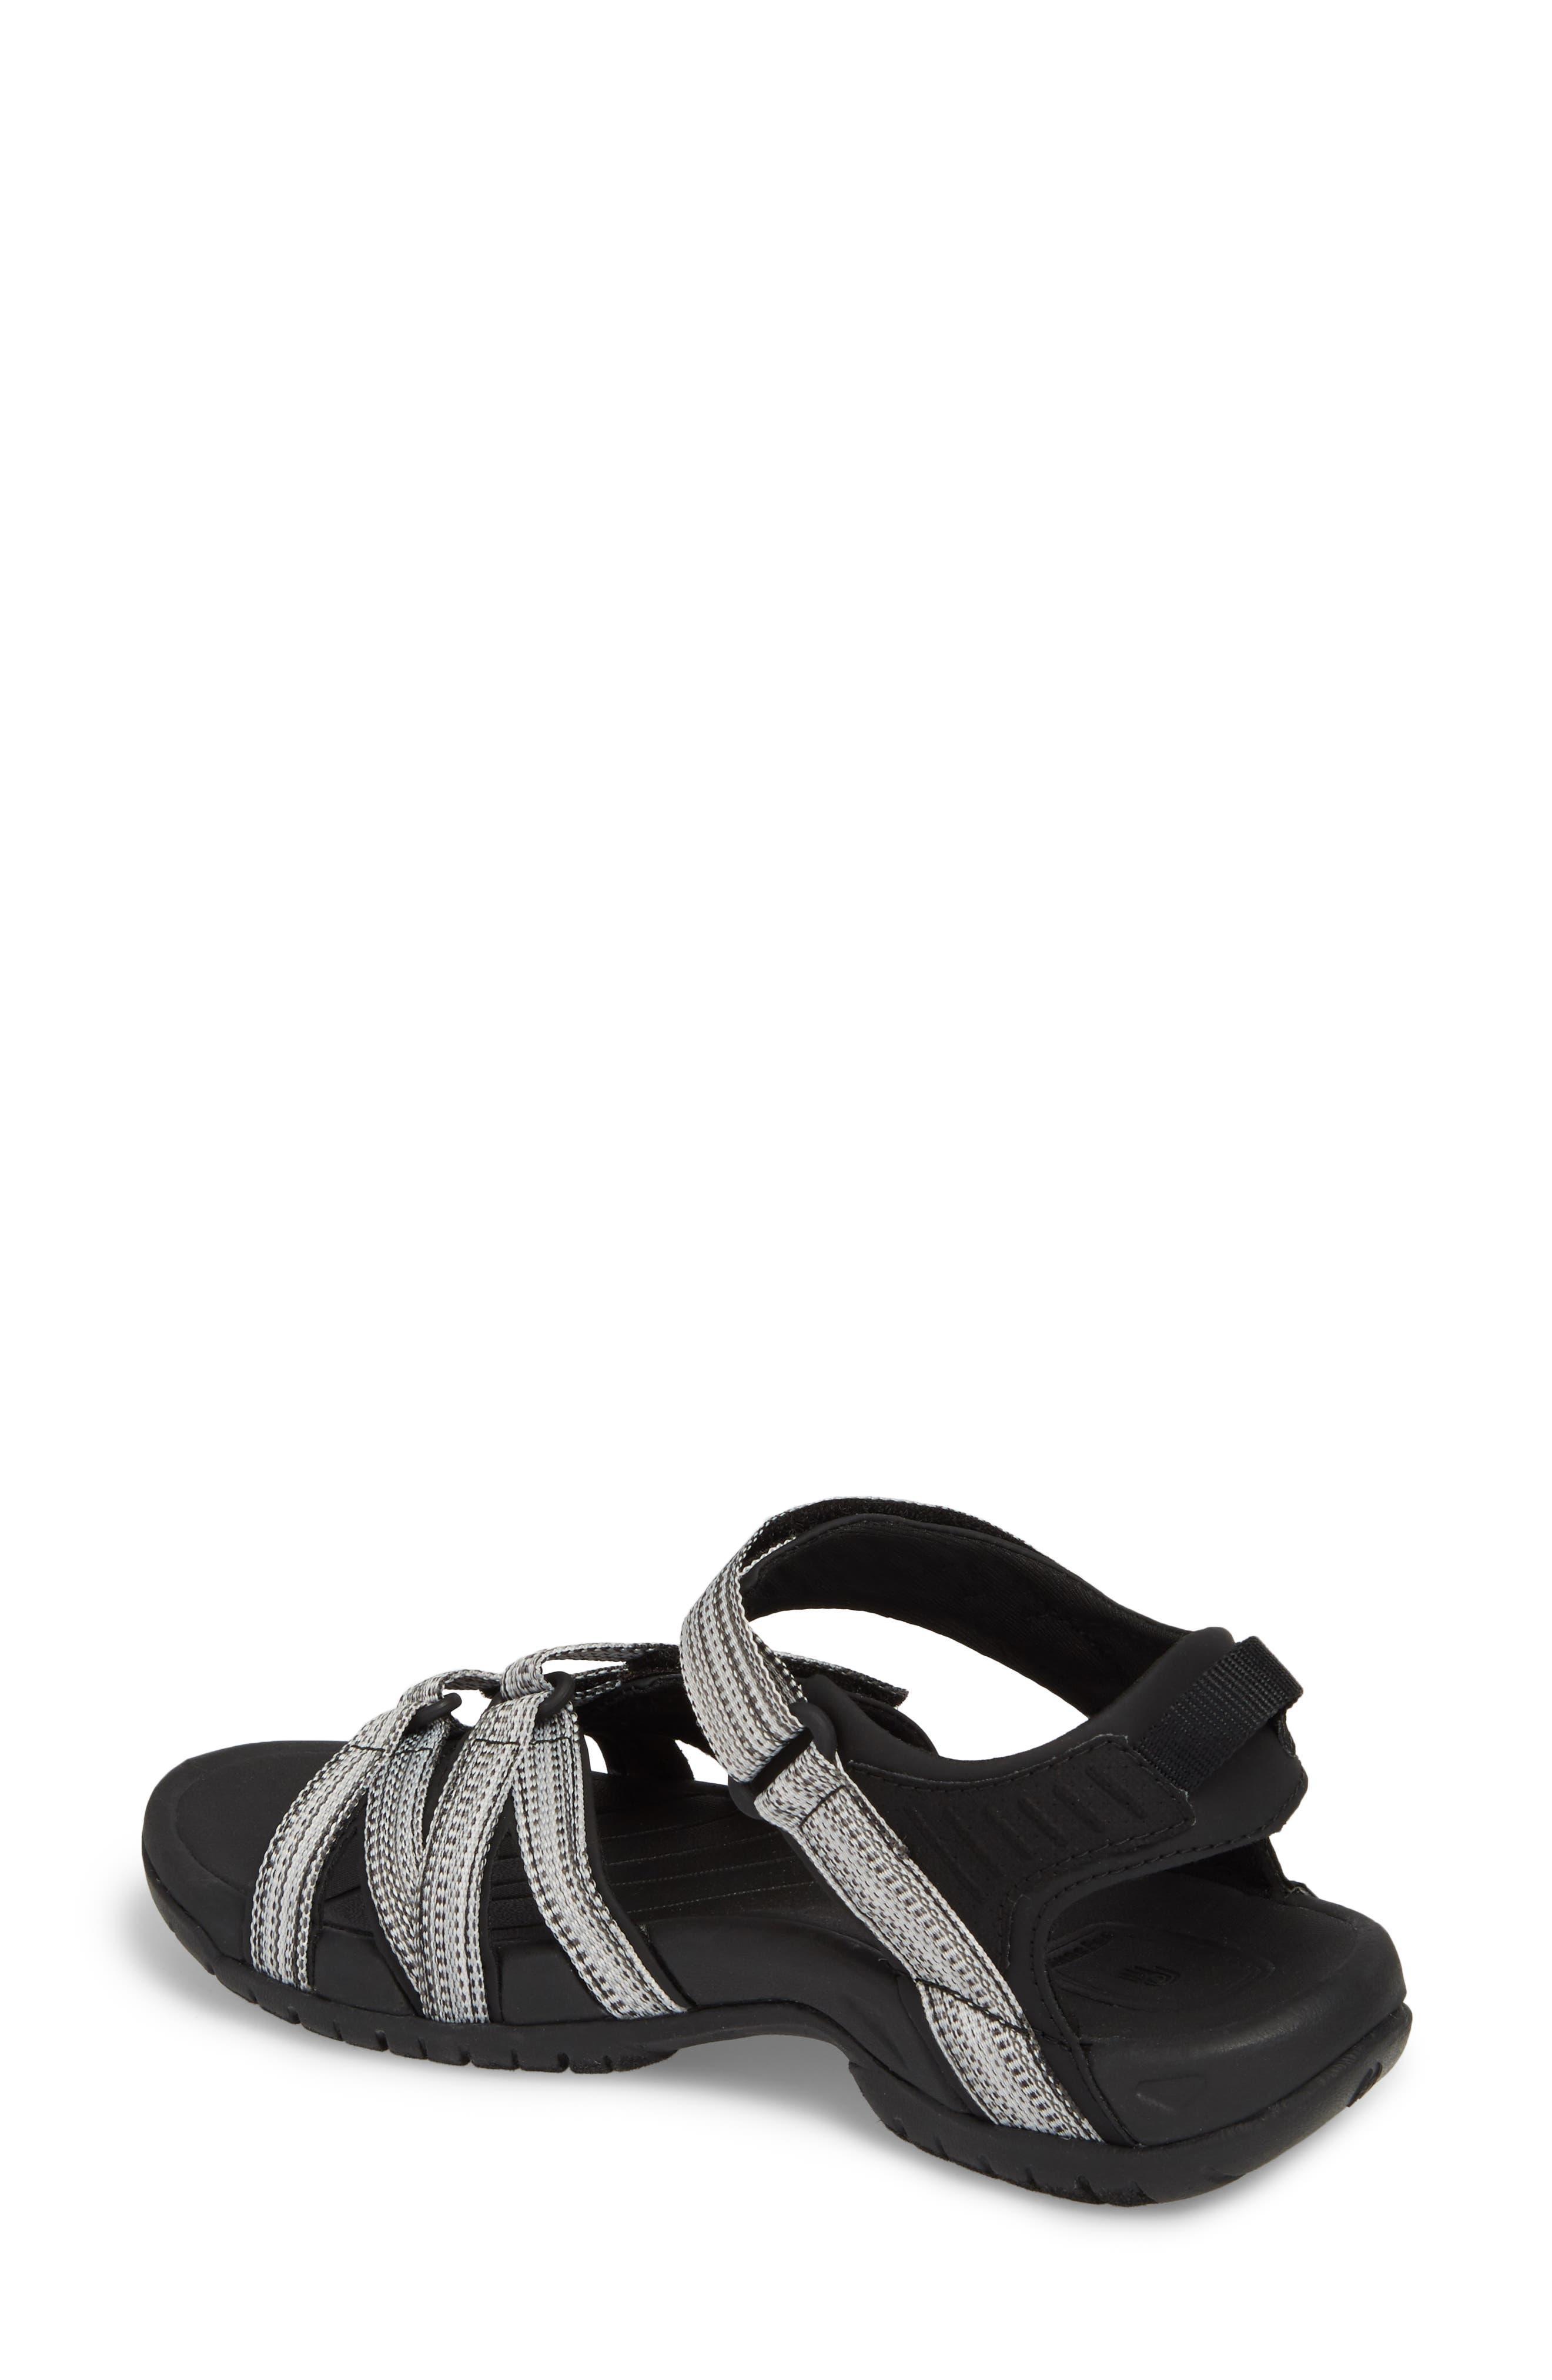 'Tirra' Sandal,                             Alternate thumbnail 2, color,                             Black/ White Multi Fabric